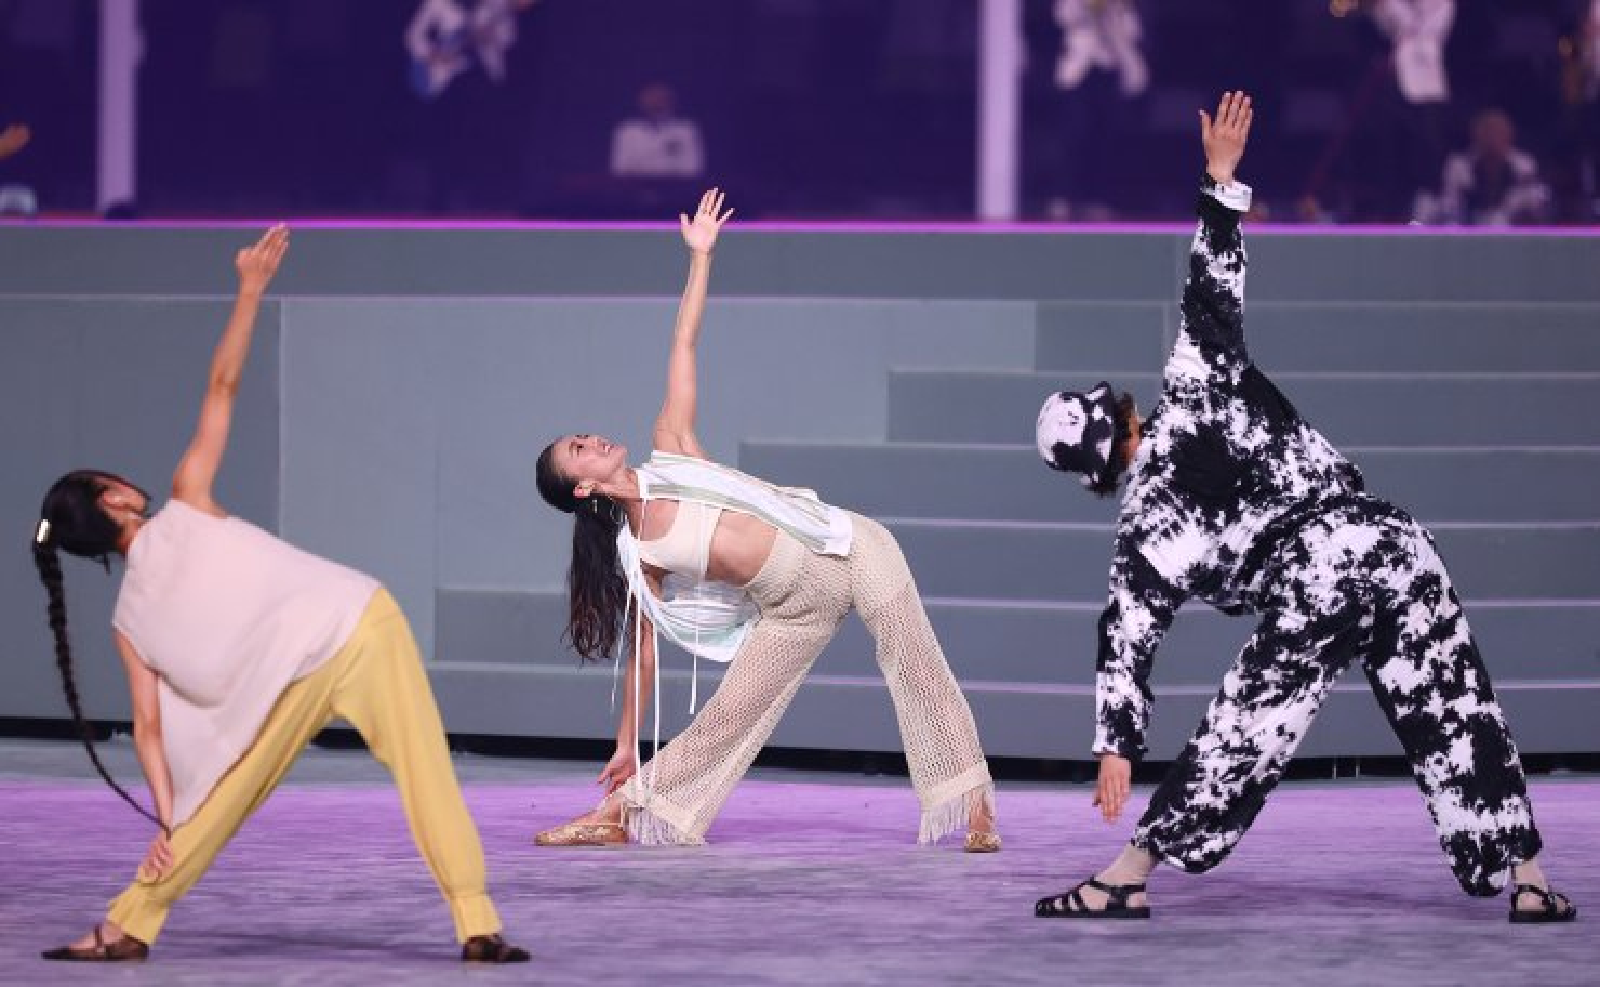 Tokyo 2020 Olympics - The Tokyo 2020 Olympics Closing Ceremony - Olympic Stadium, Tokyo, Japan - August 8, 2021. Performers inside the stadium during the closing ceremony. REUTERS